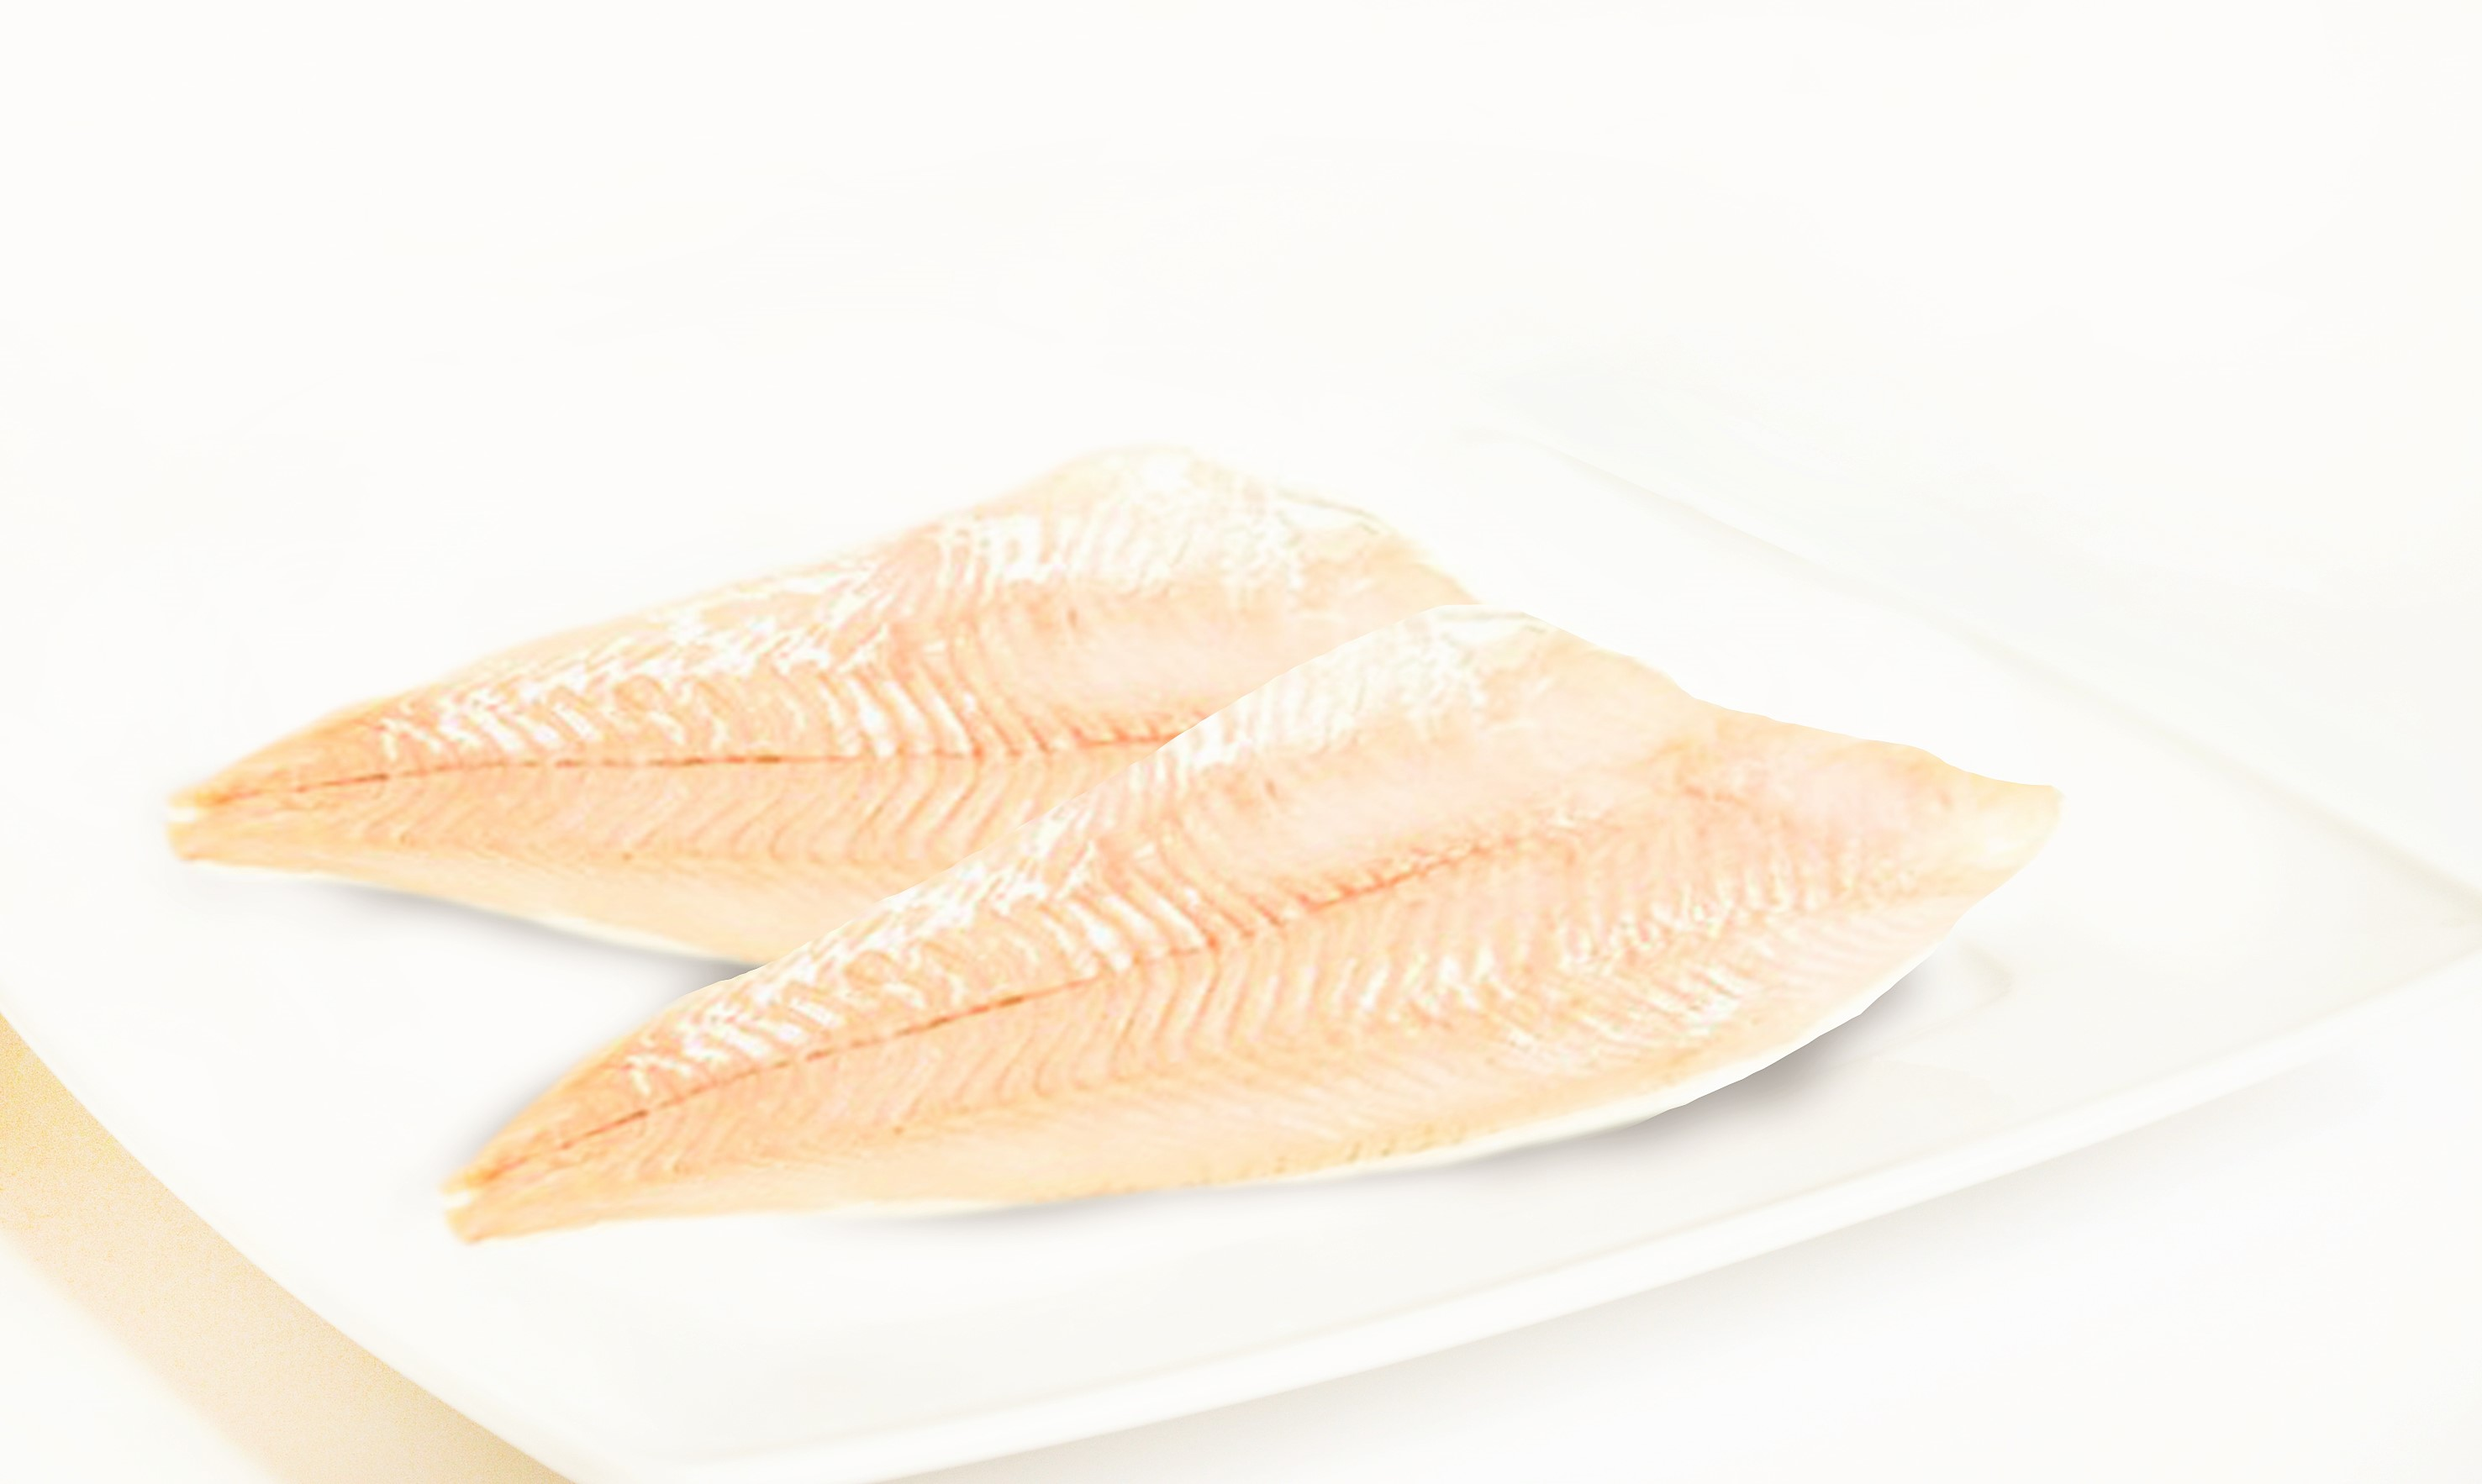 Hake fillet skinless - MyFood fish and seafood